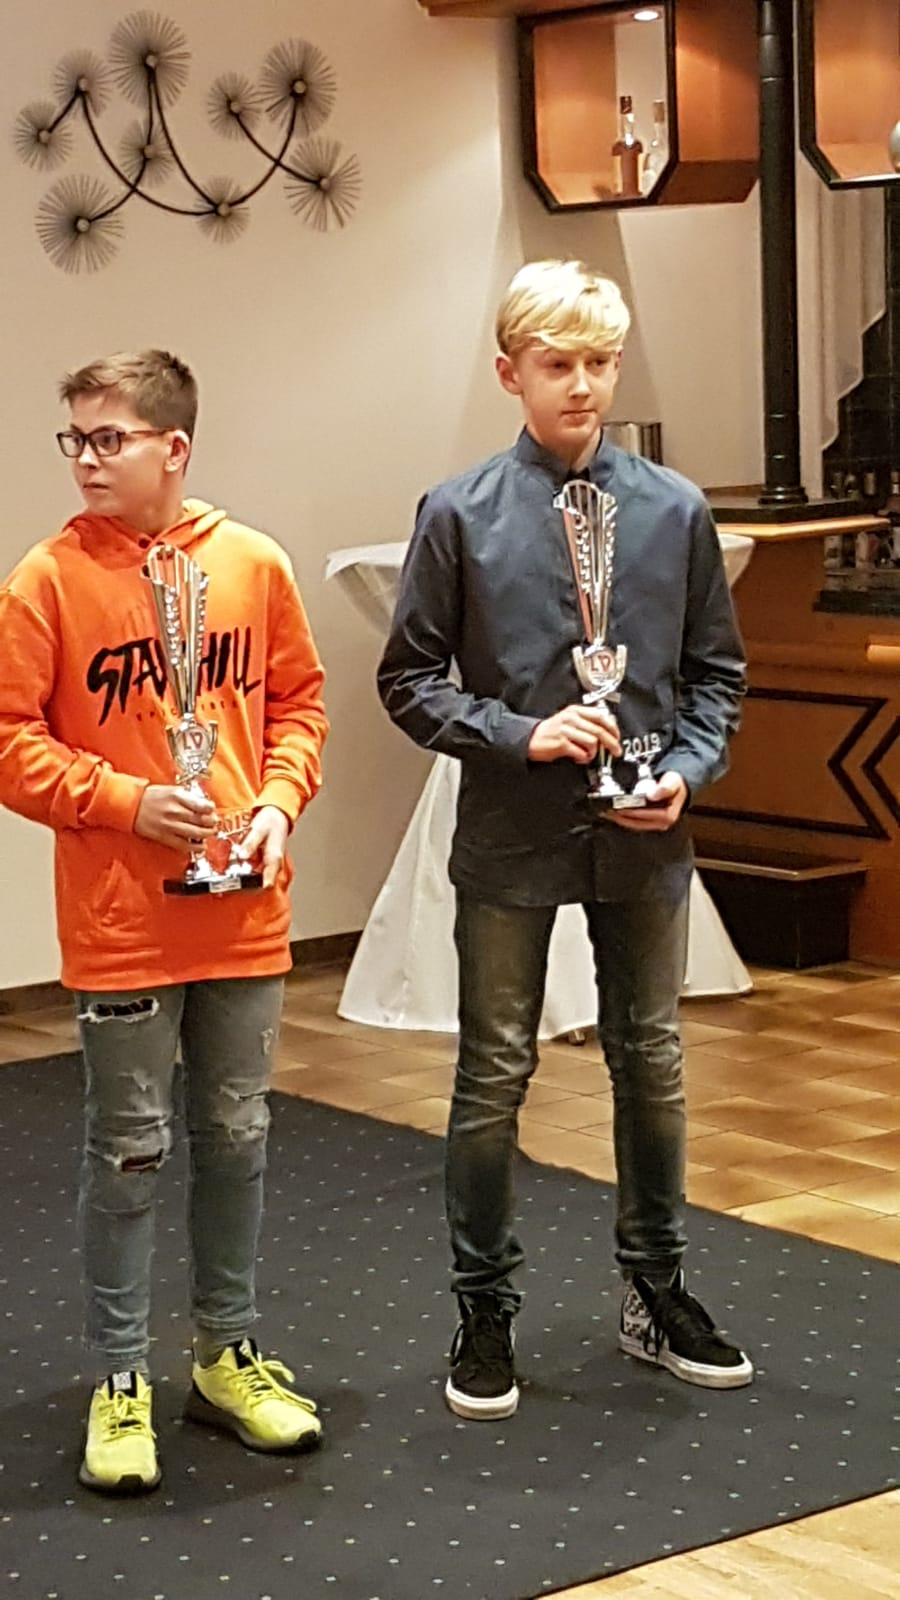 Damian Schmidt als Regionsbester in der U14 geehrt